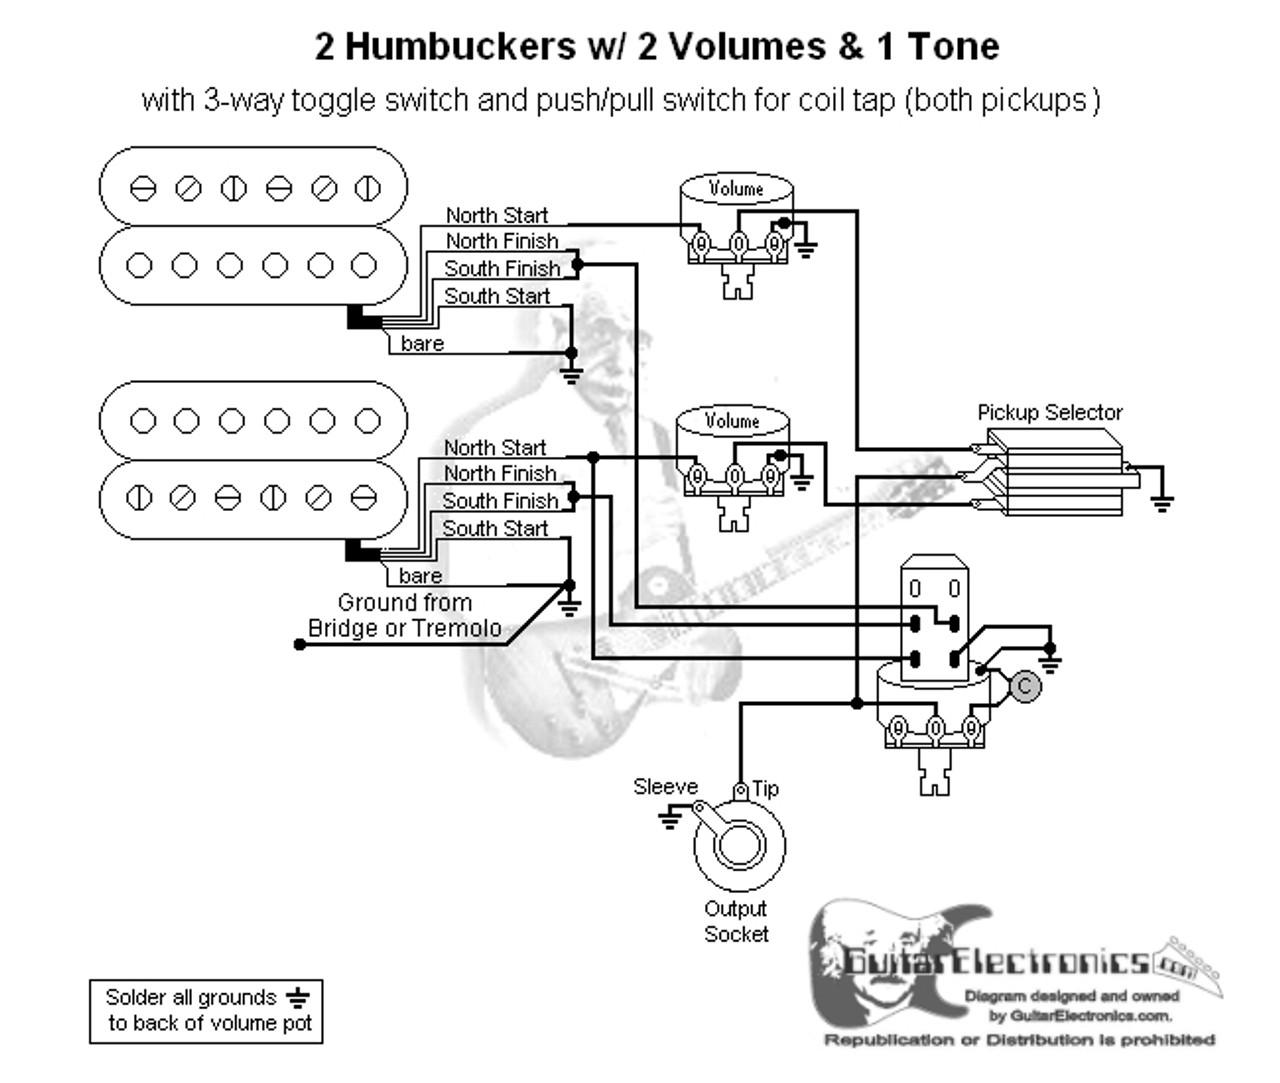 diagram 2 humbuckers 3way toggle switch 2 volumes 1 tone coil tap diagram 2 humbuckers 3 way lever switch 2 volumes 1 tone individual [ 1280 x 1083 Pixel ]